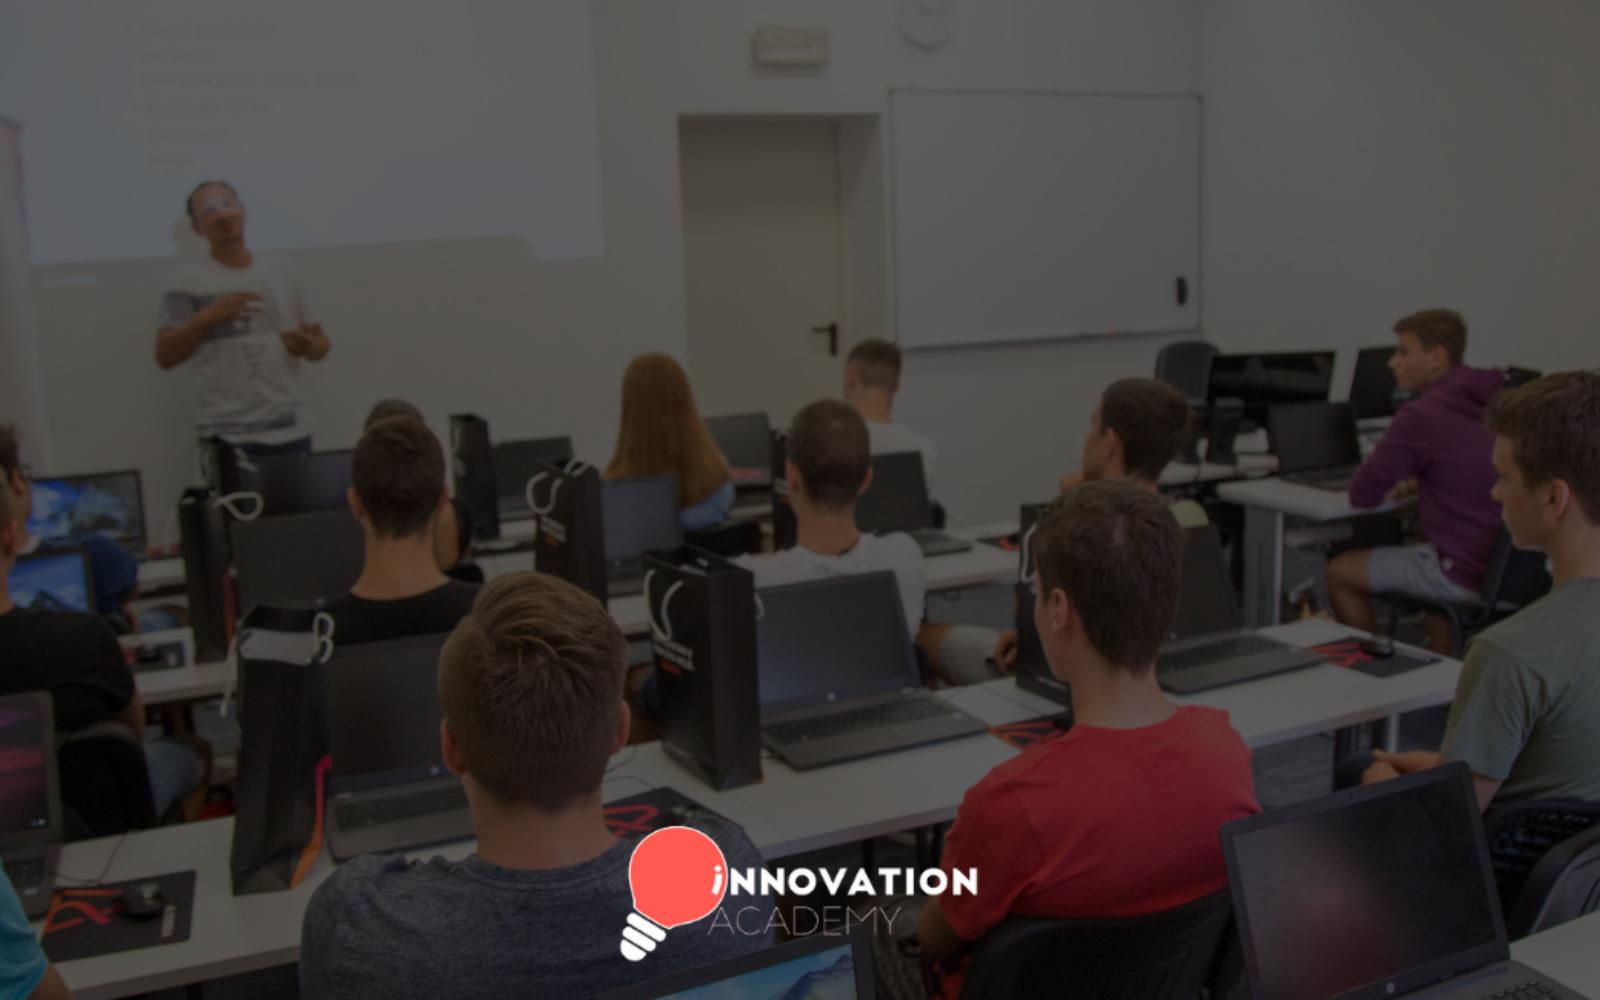 Srednjoškolci, prijavite se na Innovation academy!